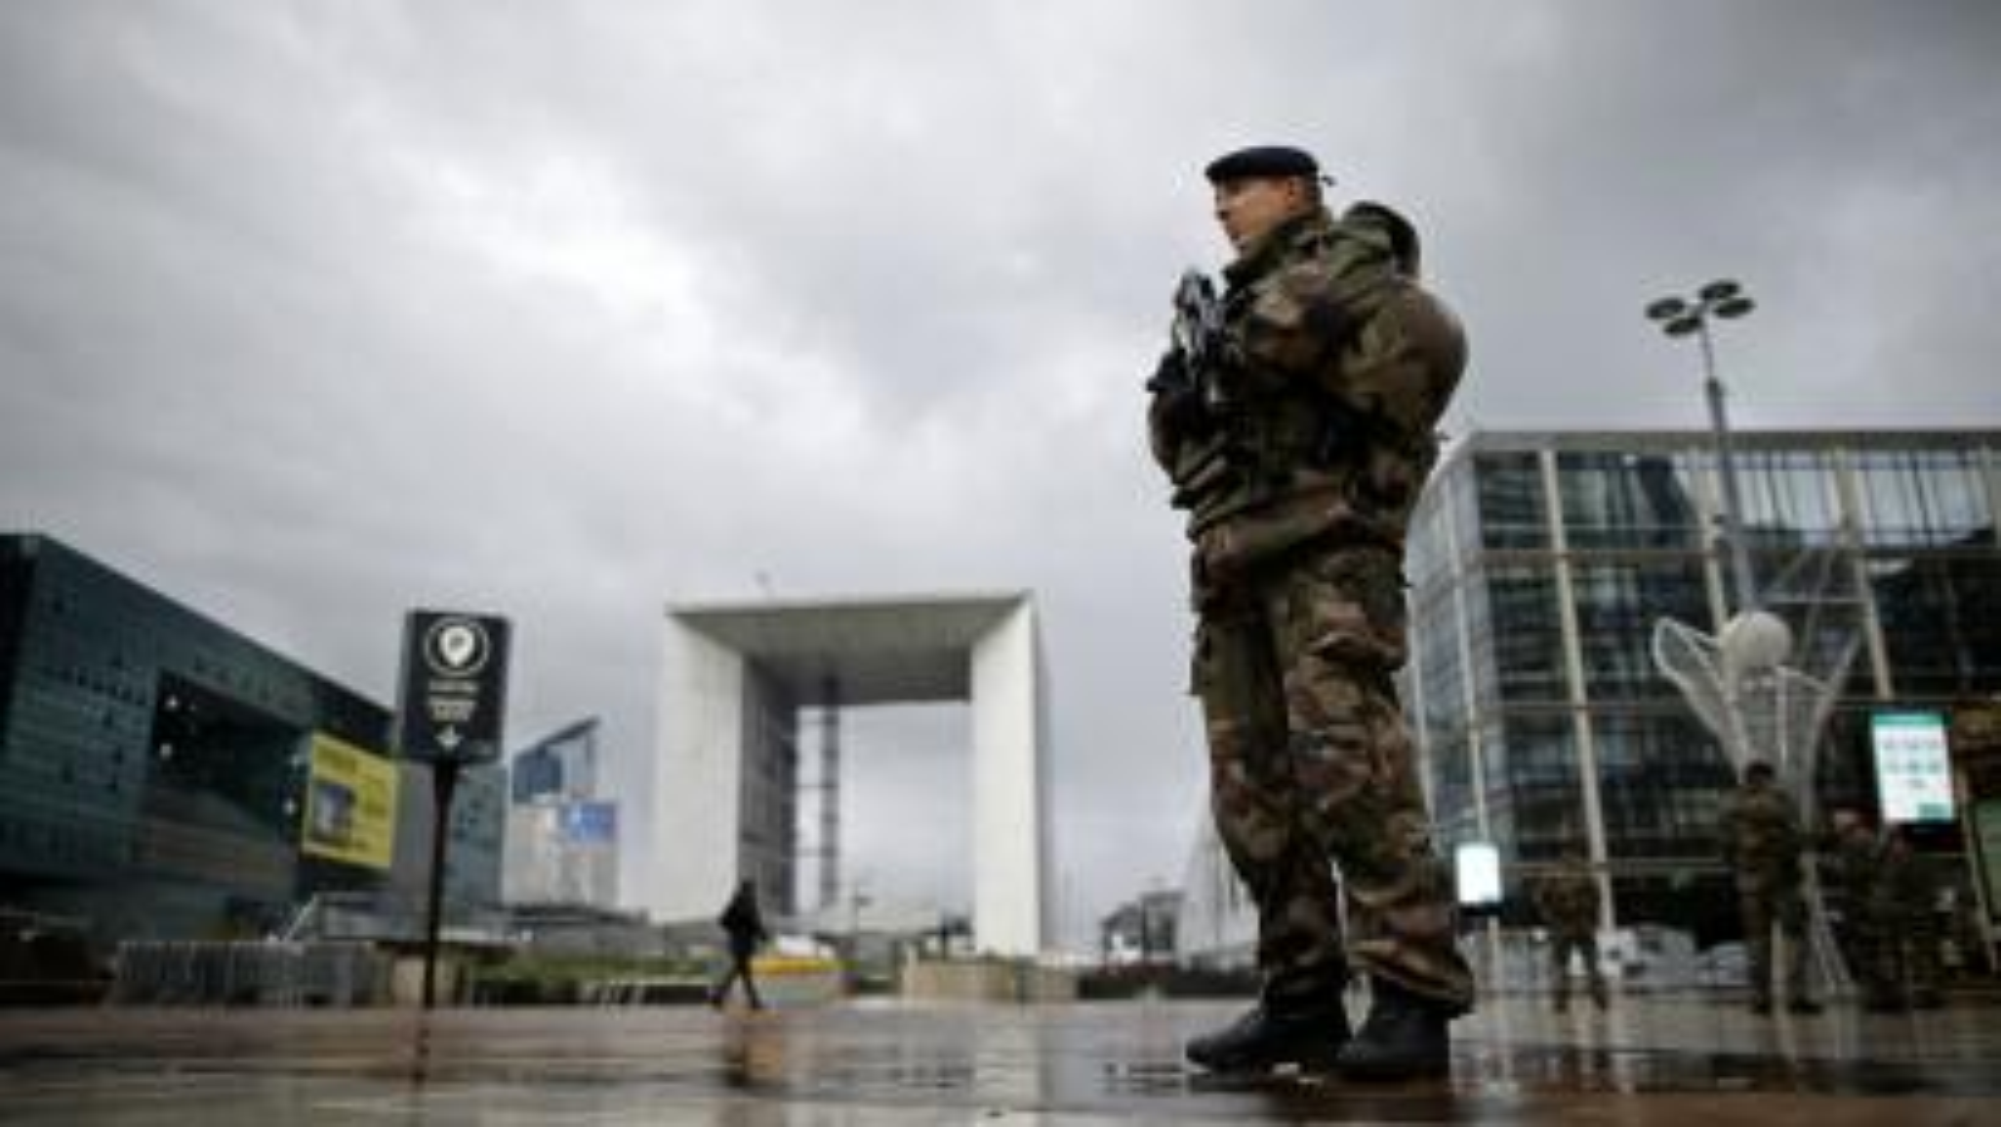 A French soldier patrols near the Arche de la Defense at La Defense business district near Paris, France, November 25, 2015.